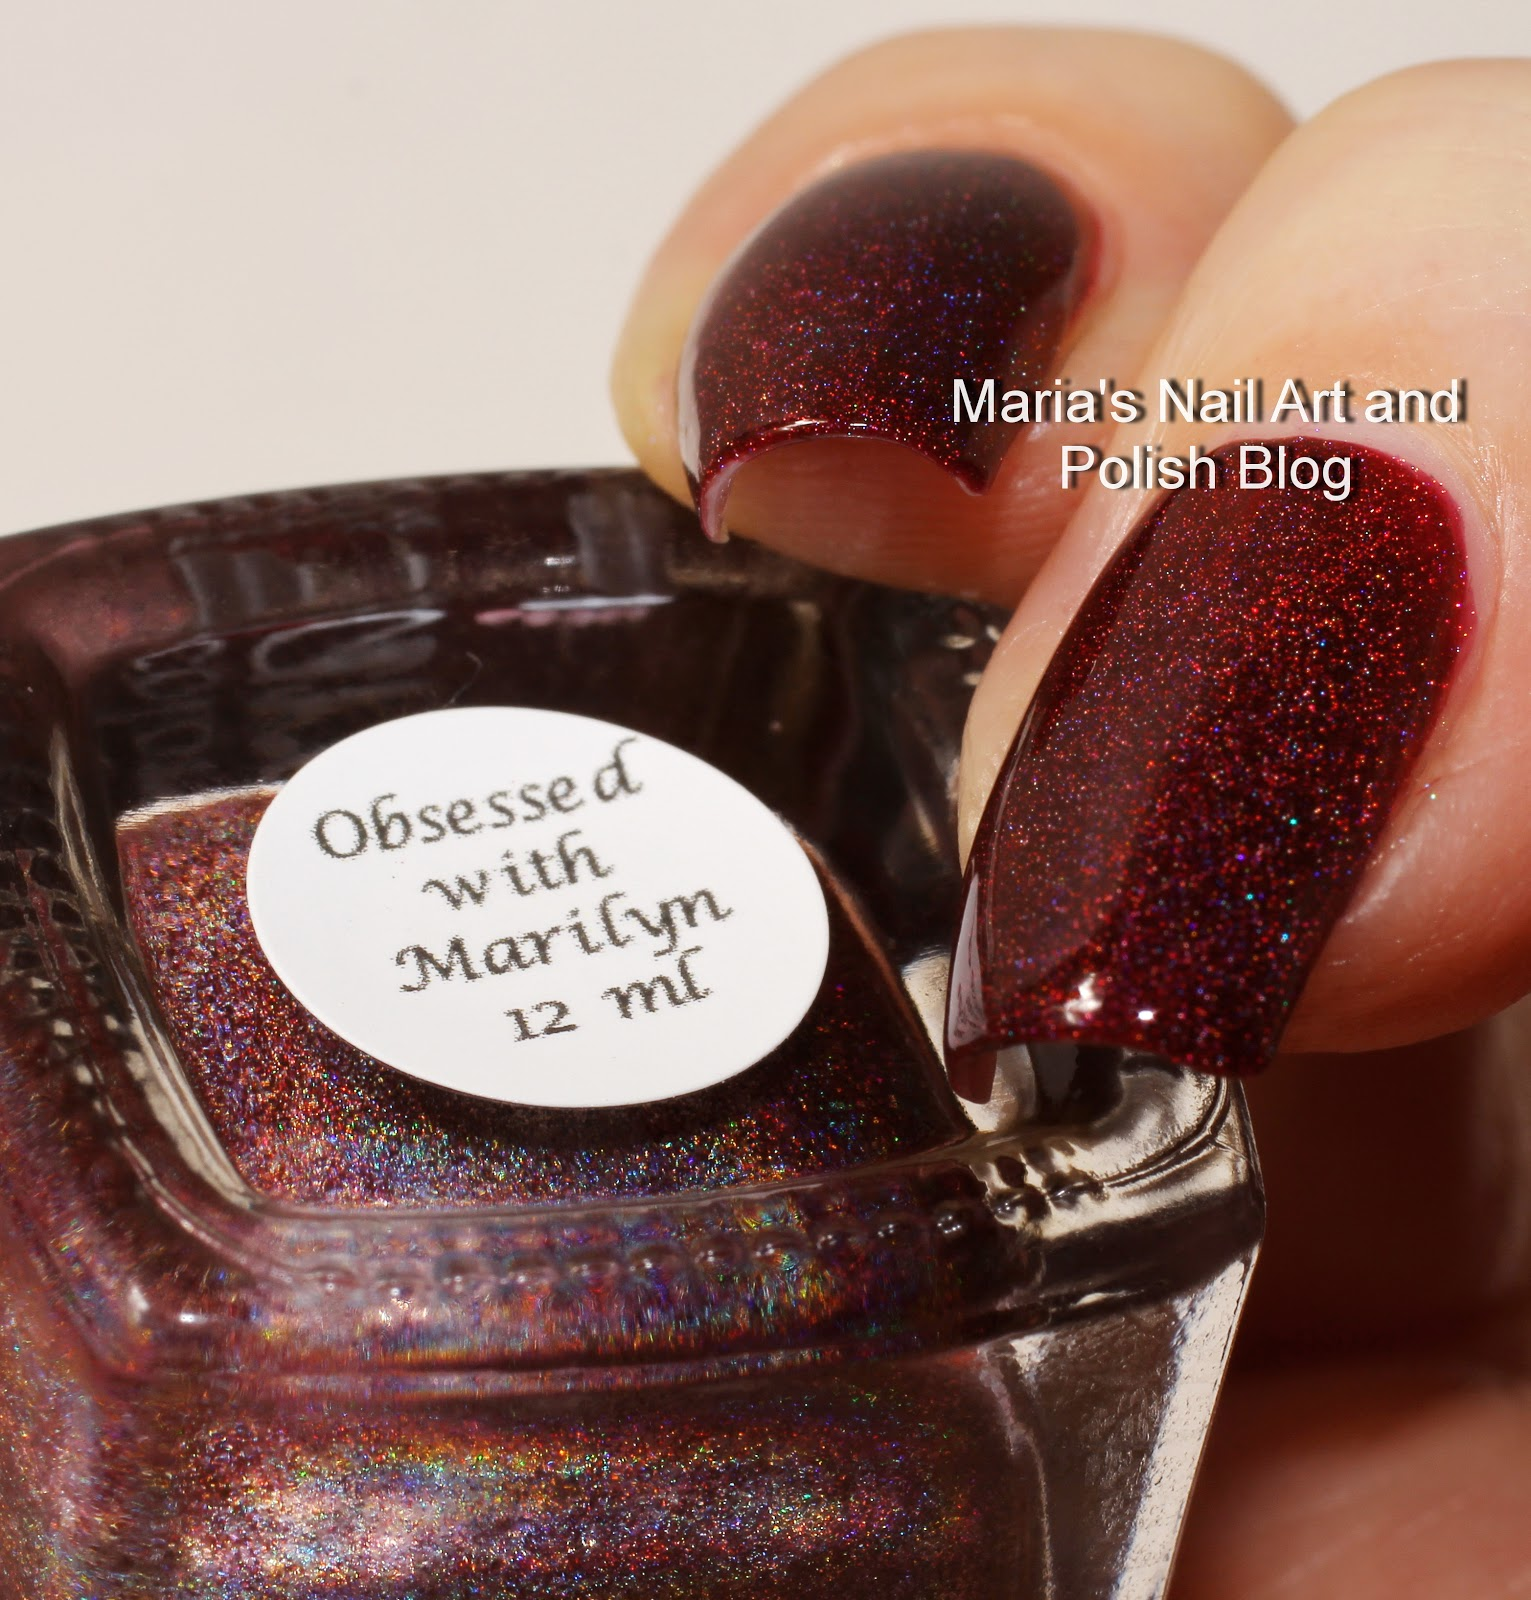 Marias Nail Art And Polish Blog Flushed With Stripes And: Marias Nail Art And Polish Blog: Colors By Llarowe (CBL